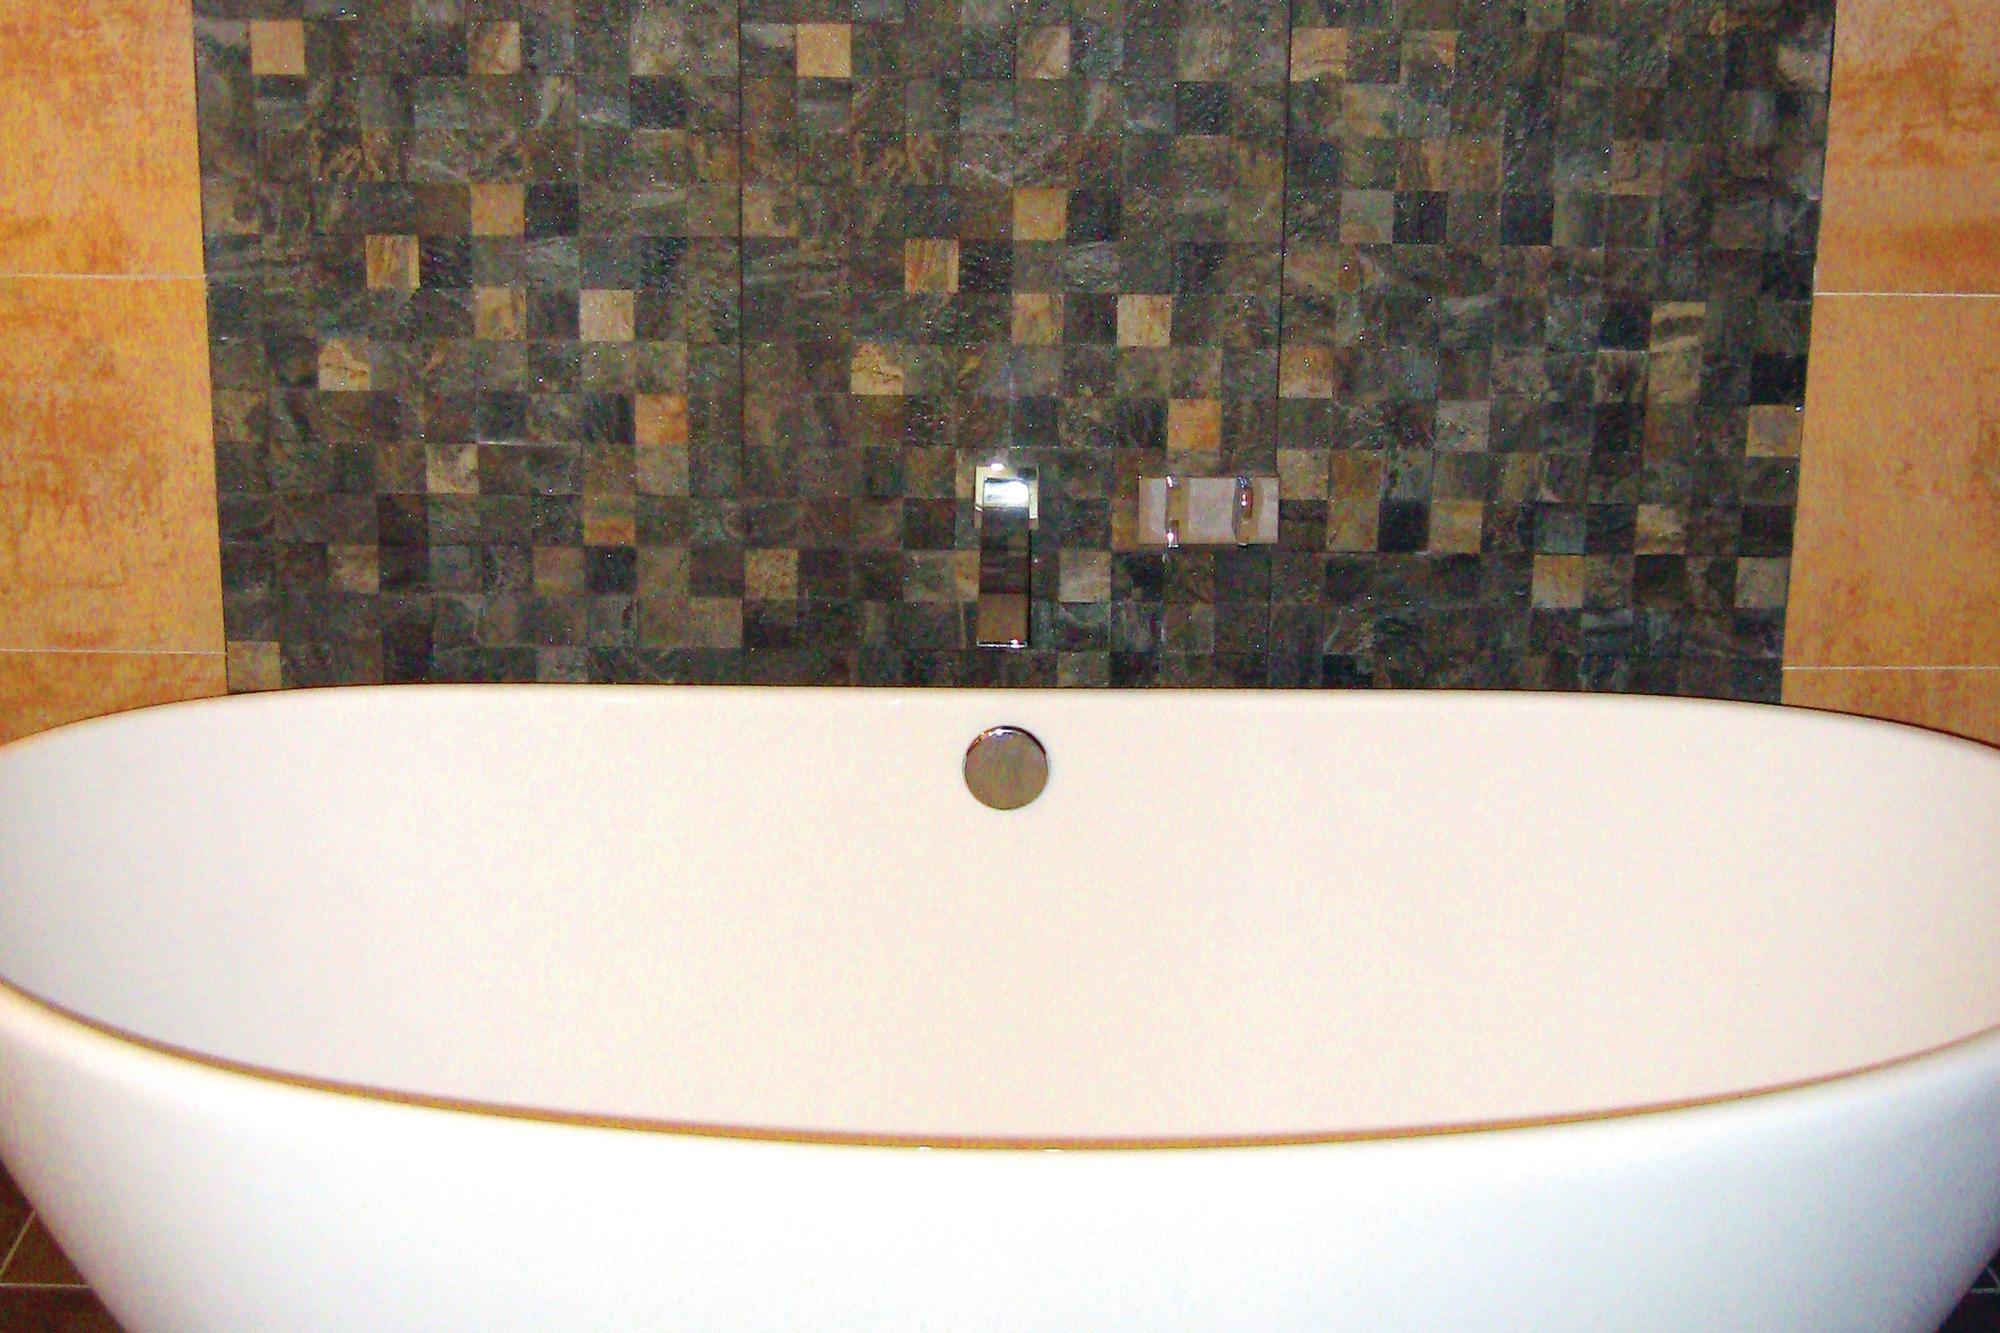 A Textured Backsplash Anchors A Freestanding Tub Builder